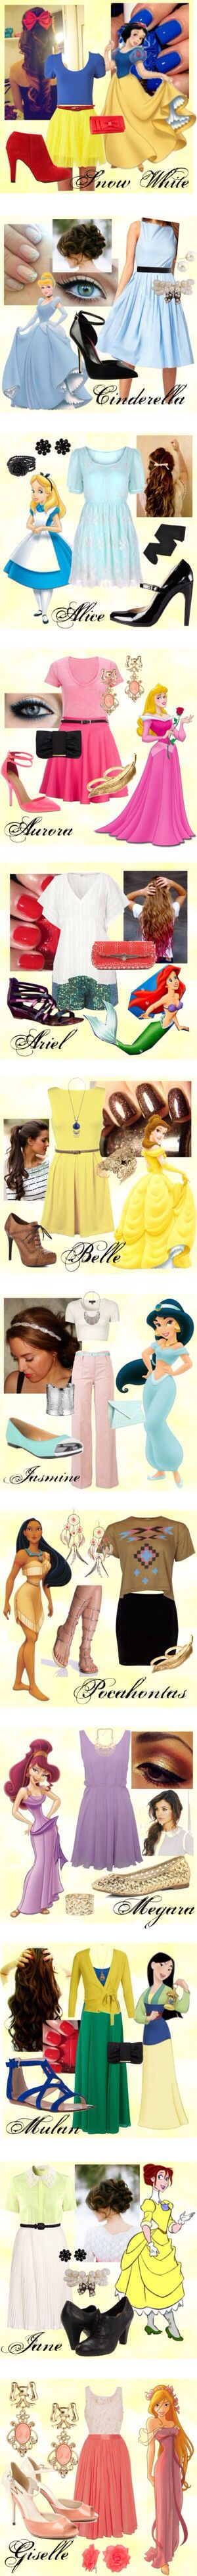 Always wanted to dress like a Disney priness!